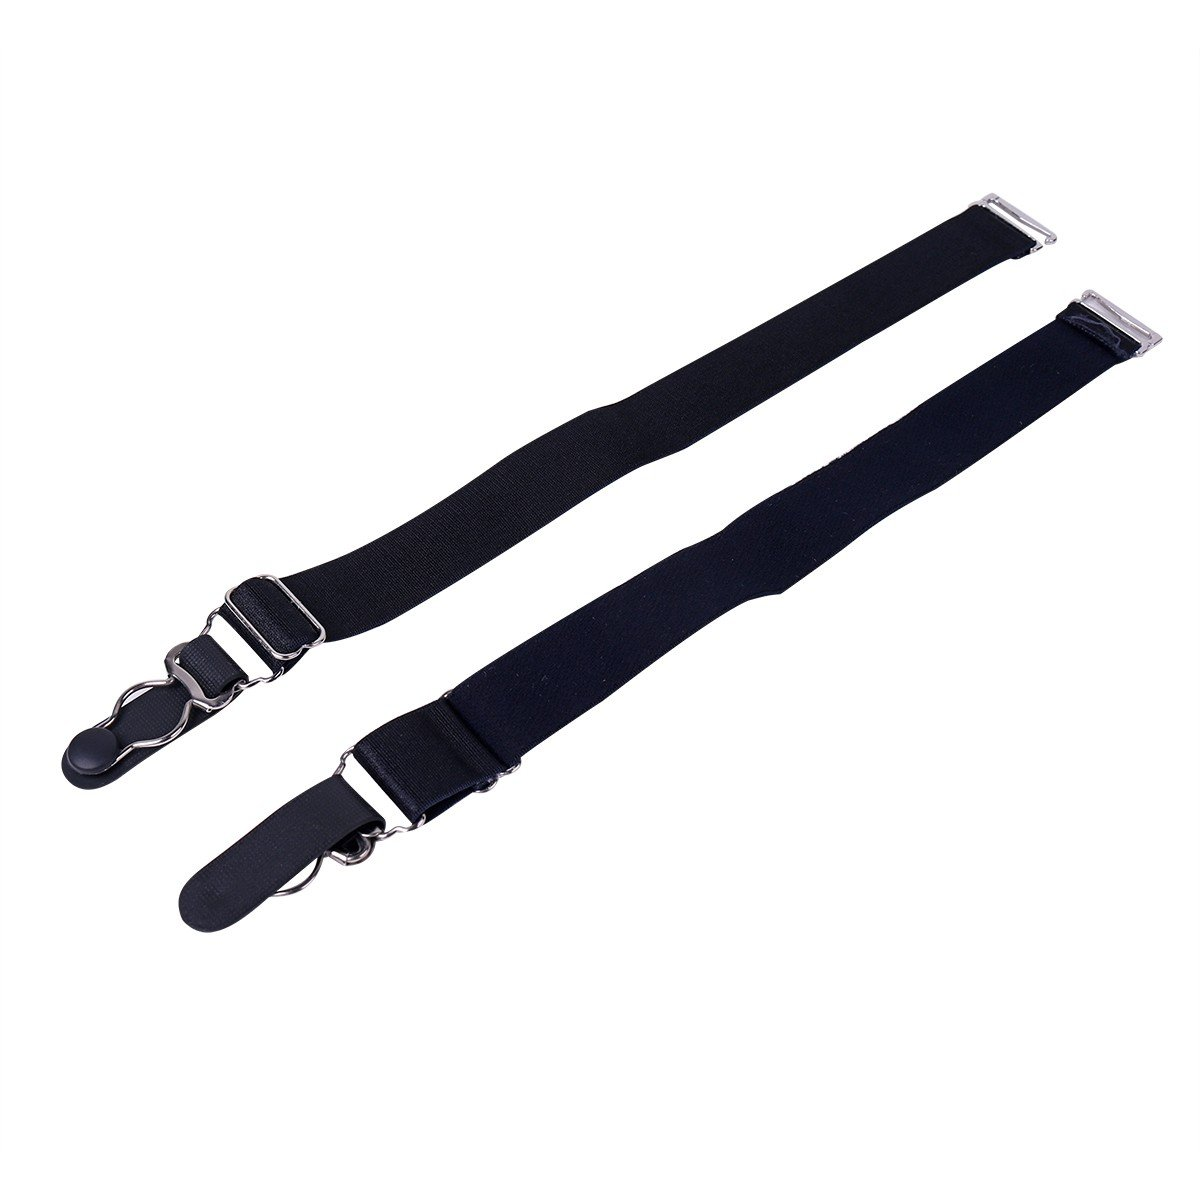 TiaoBug Elastic Garter Belts Corset Holders Stockings Fastener Suspender with Duck-Mouth Metal or Plastic Clip